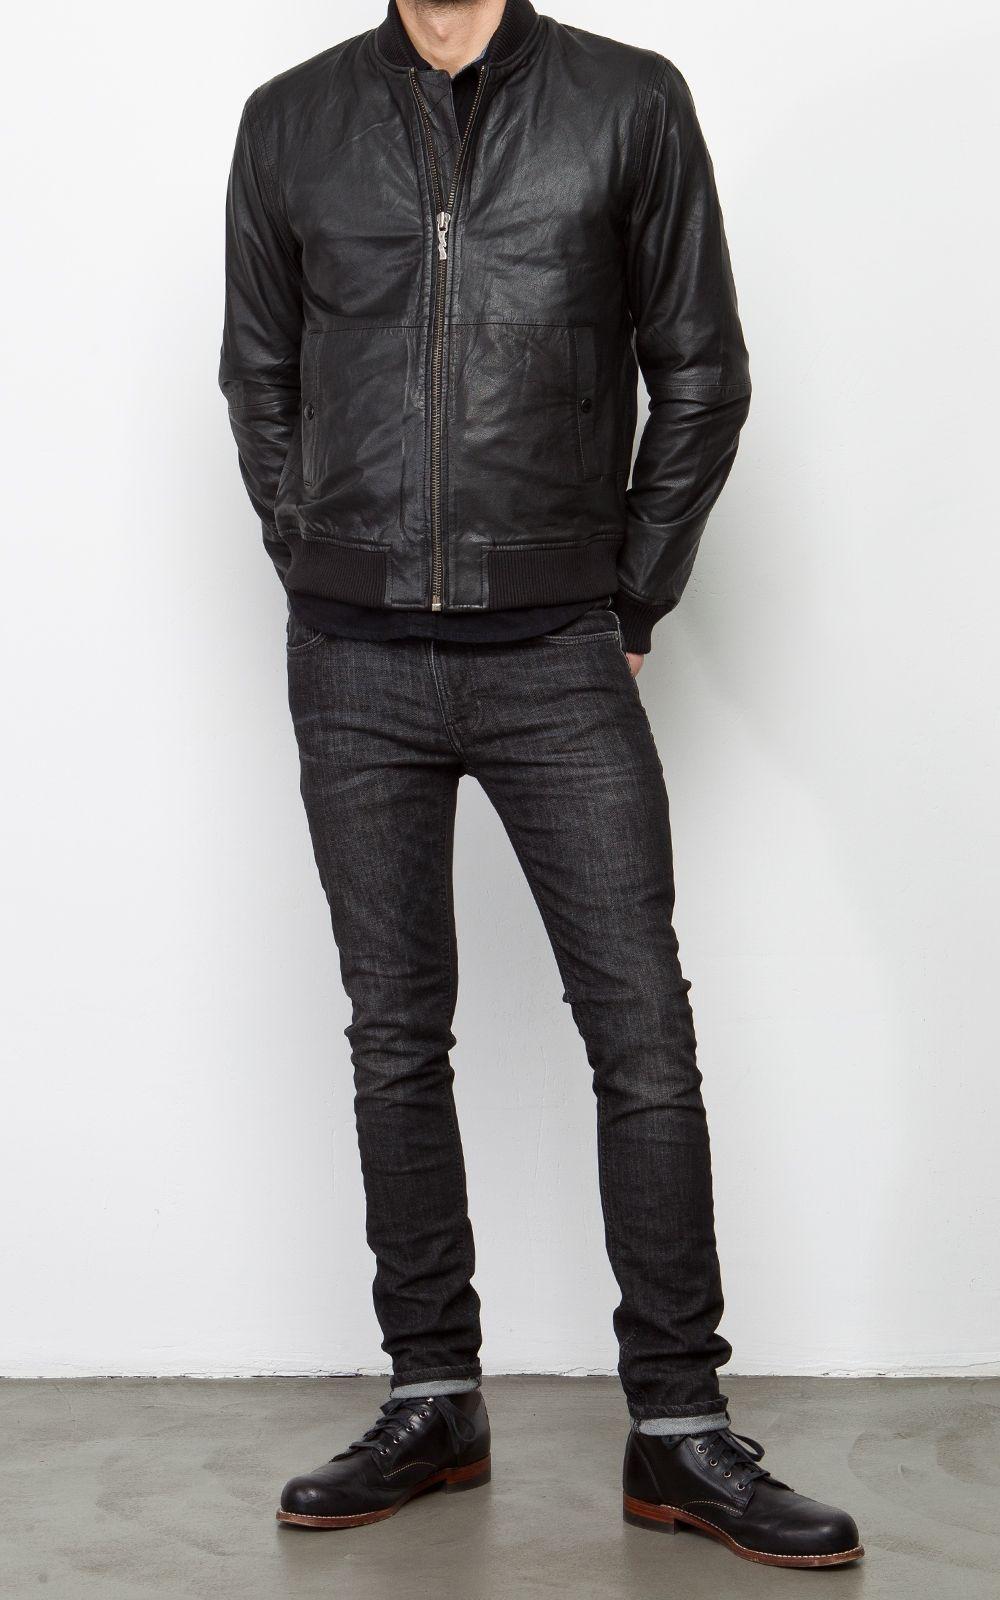 4830bc1e37 Cultizm.com - Cedric Bomber Leather Jacket Black Nudie Jeans Cedric Bomber  Leather Jacket Black 160244